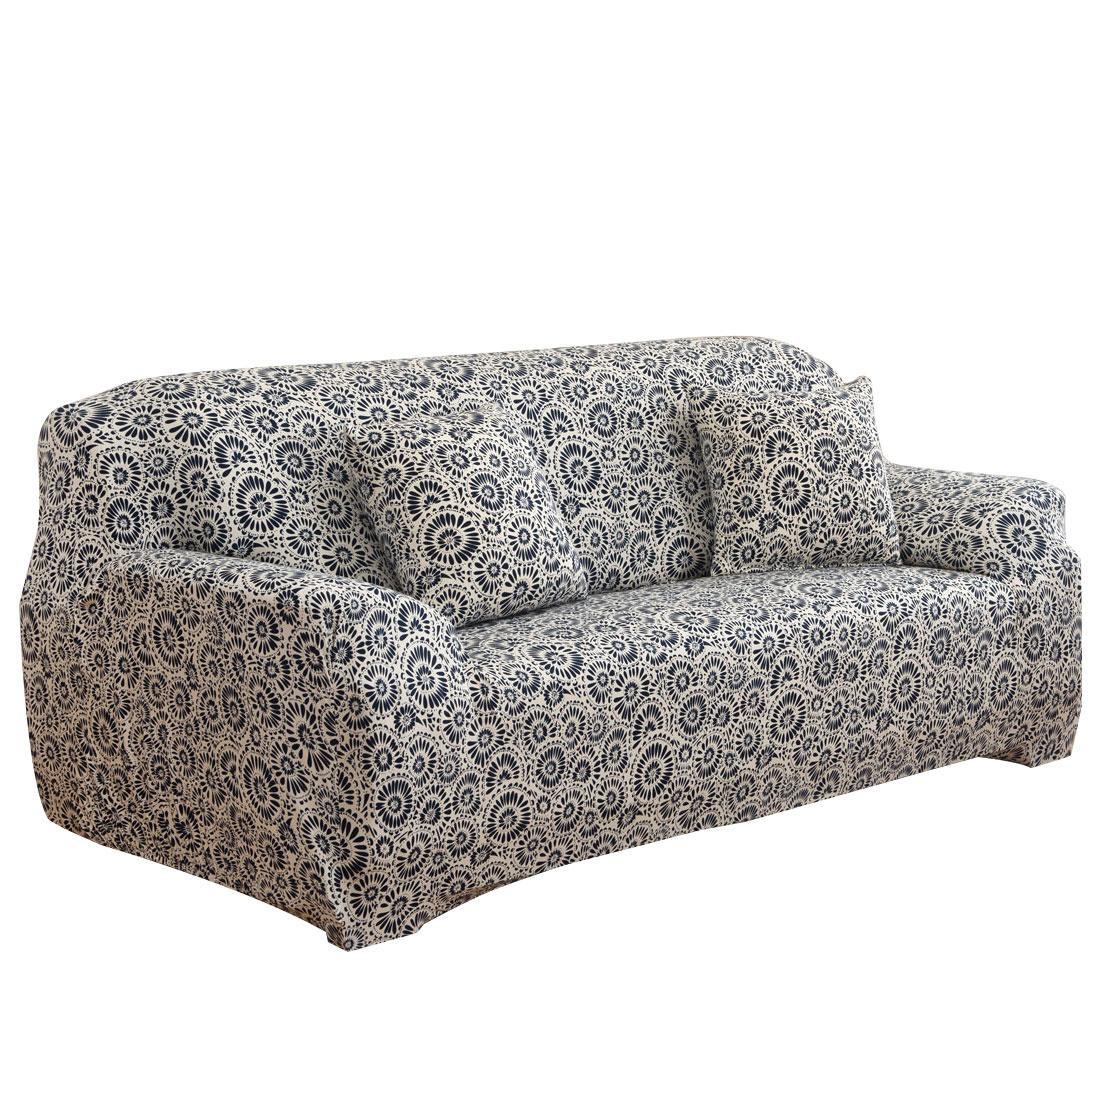 Home Polyester Ring Prints Elastic Sofa Loveseat Cover Slipcover 55